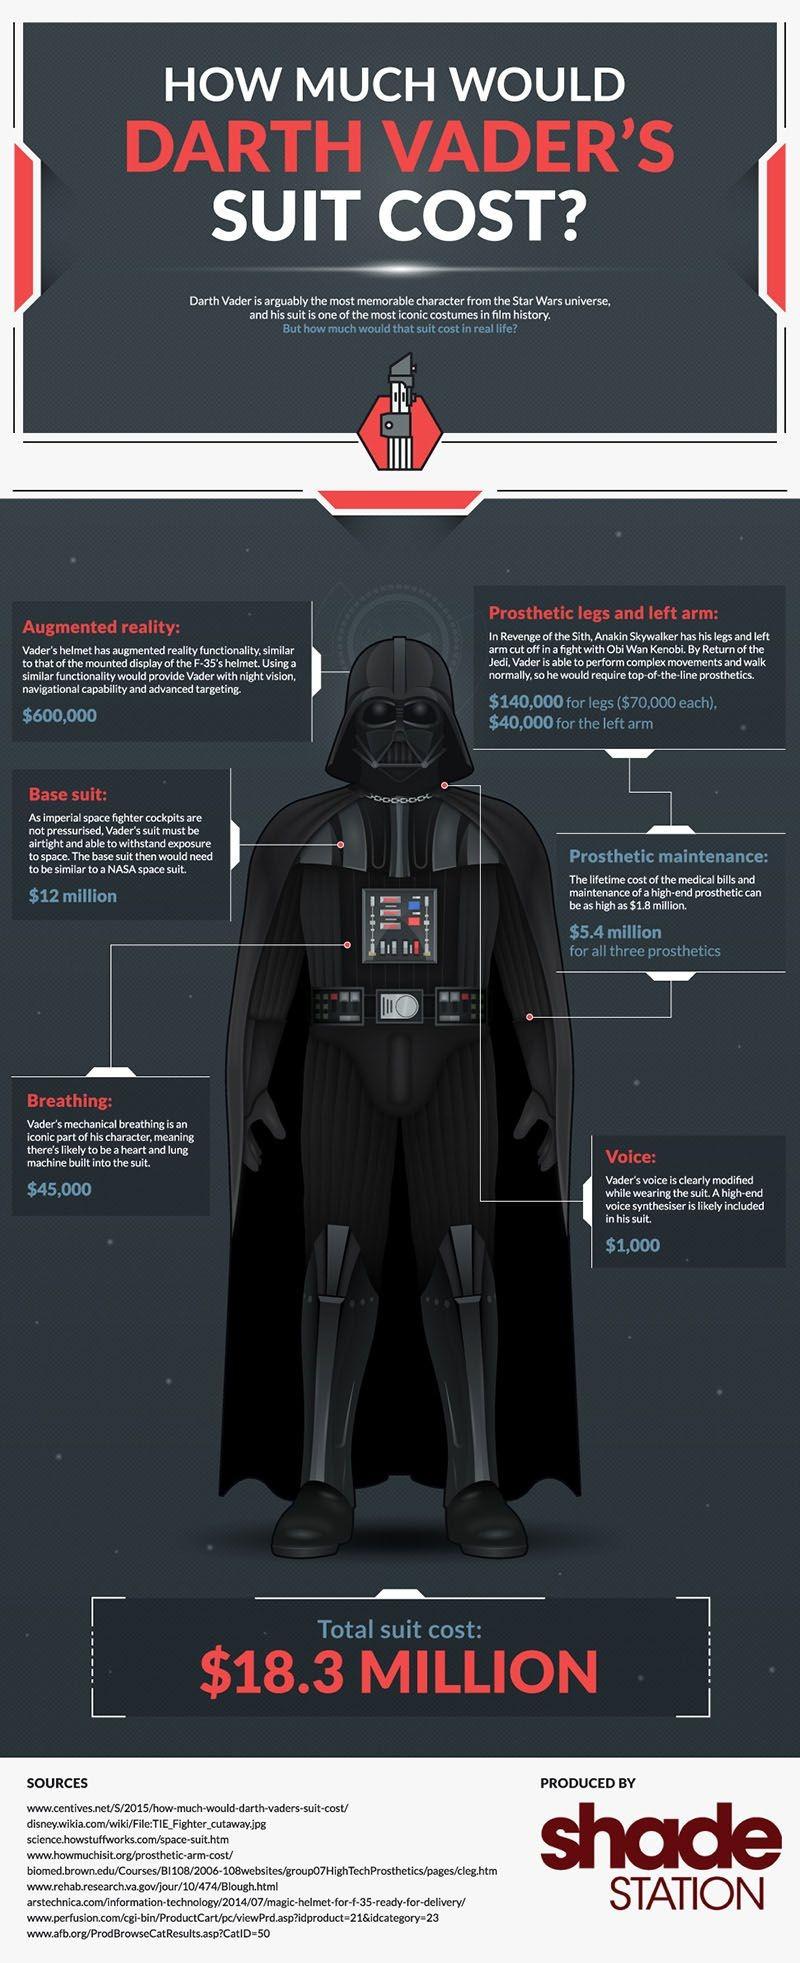 Darth_Vader_suit_cost